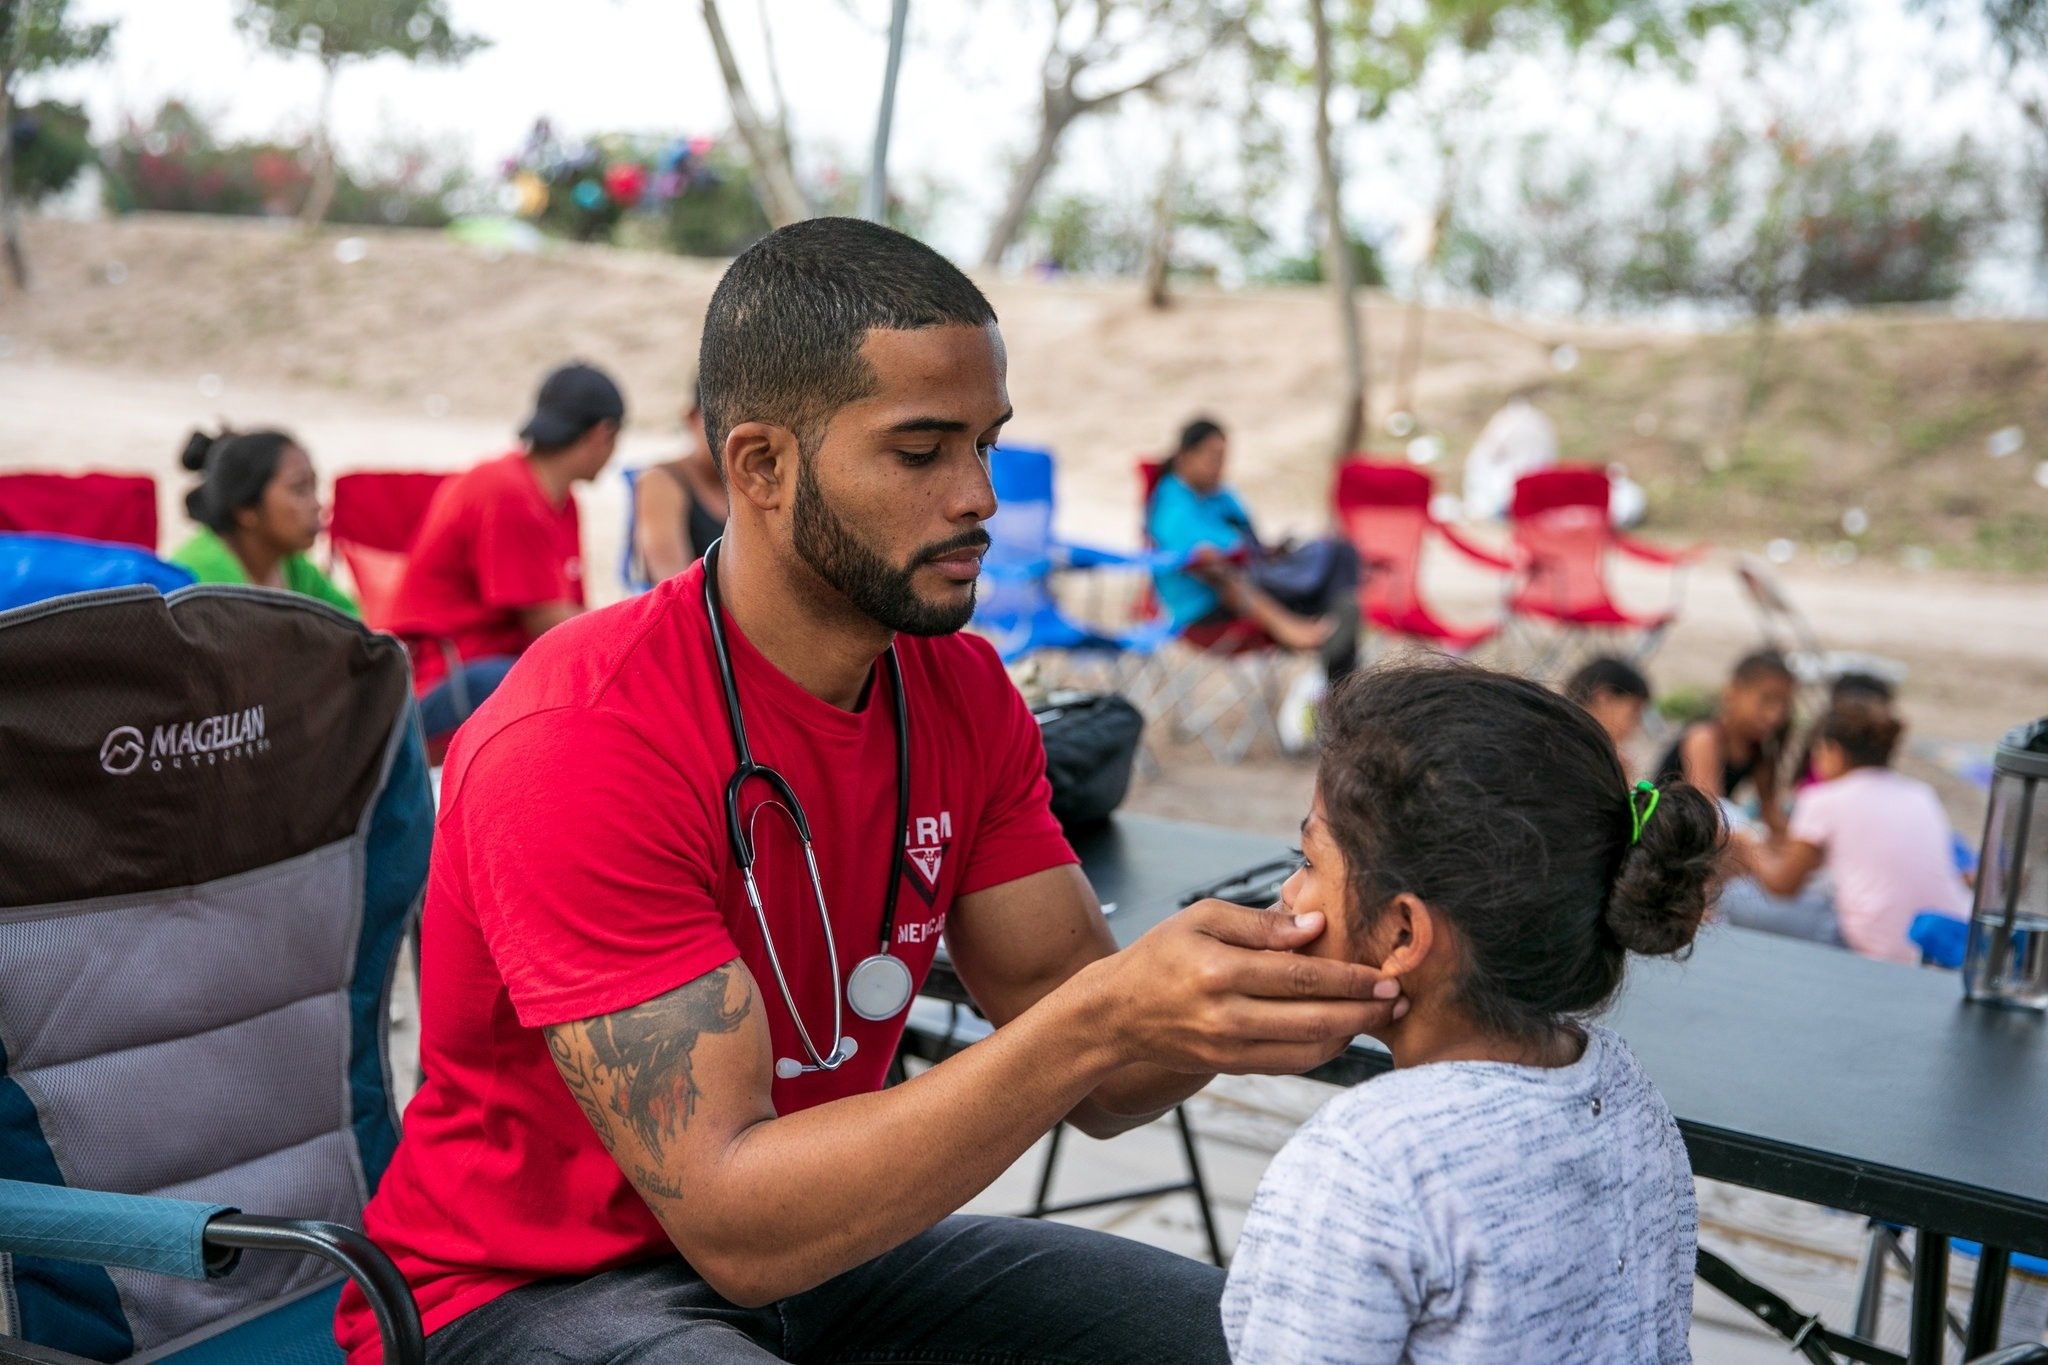 El médico cubano Dairon Elisondo trata a una niña en un campamento de migrantes en Matamoros, México. Foto: Ilana Panich-Linsman / The New York Times.